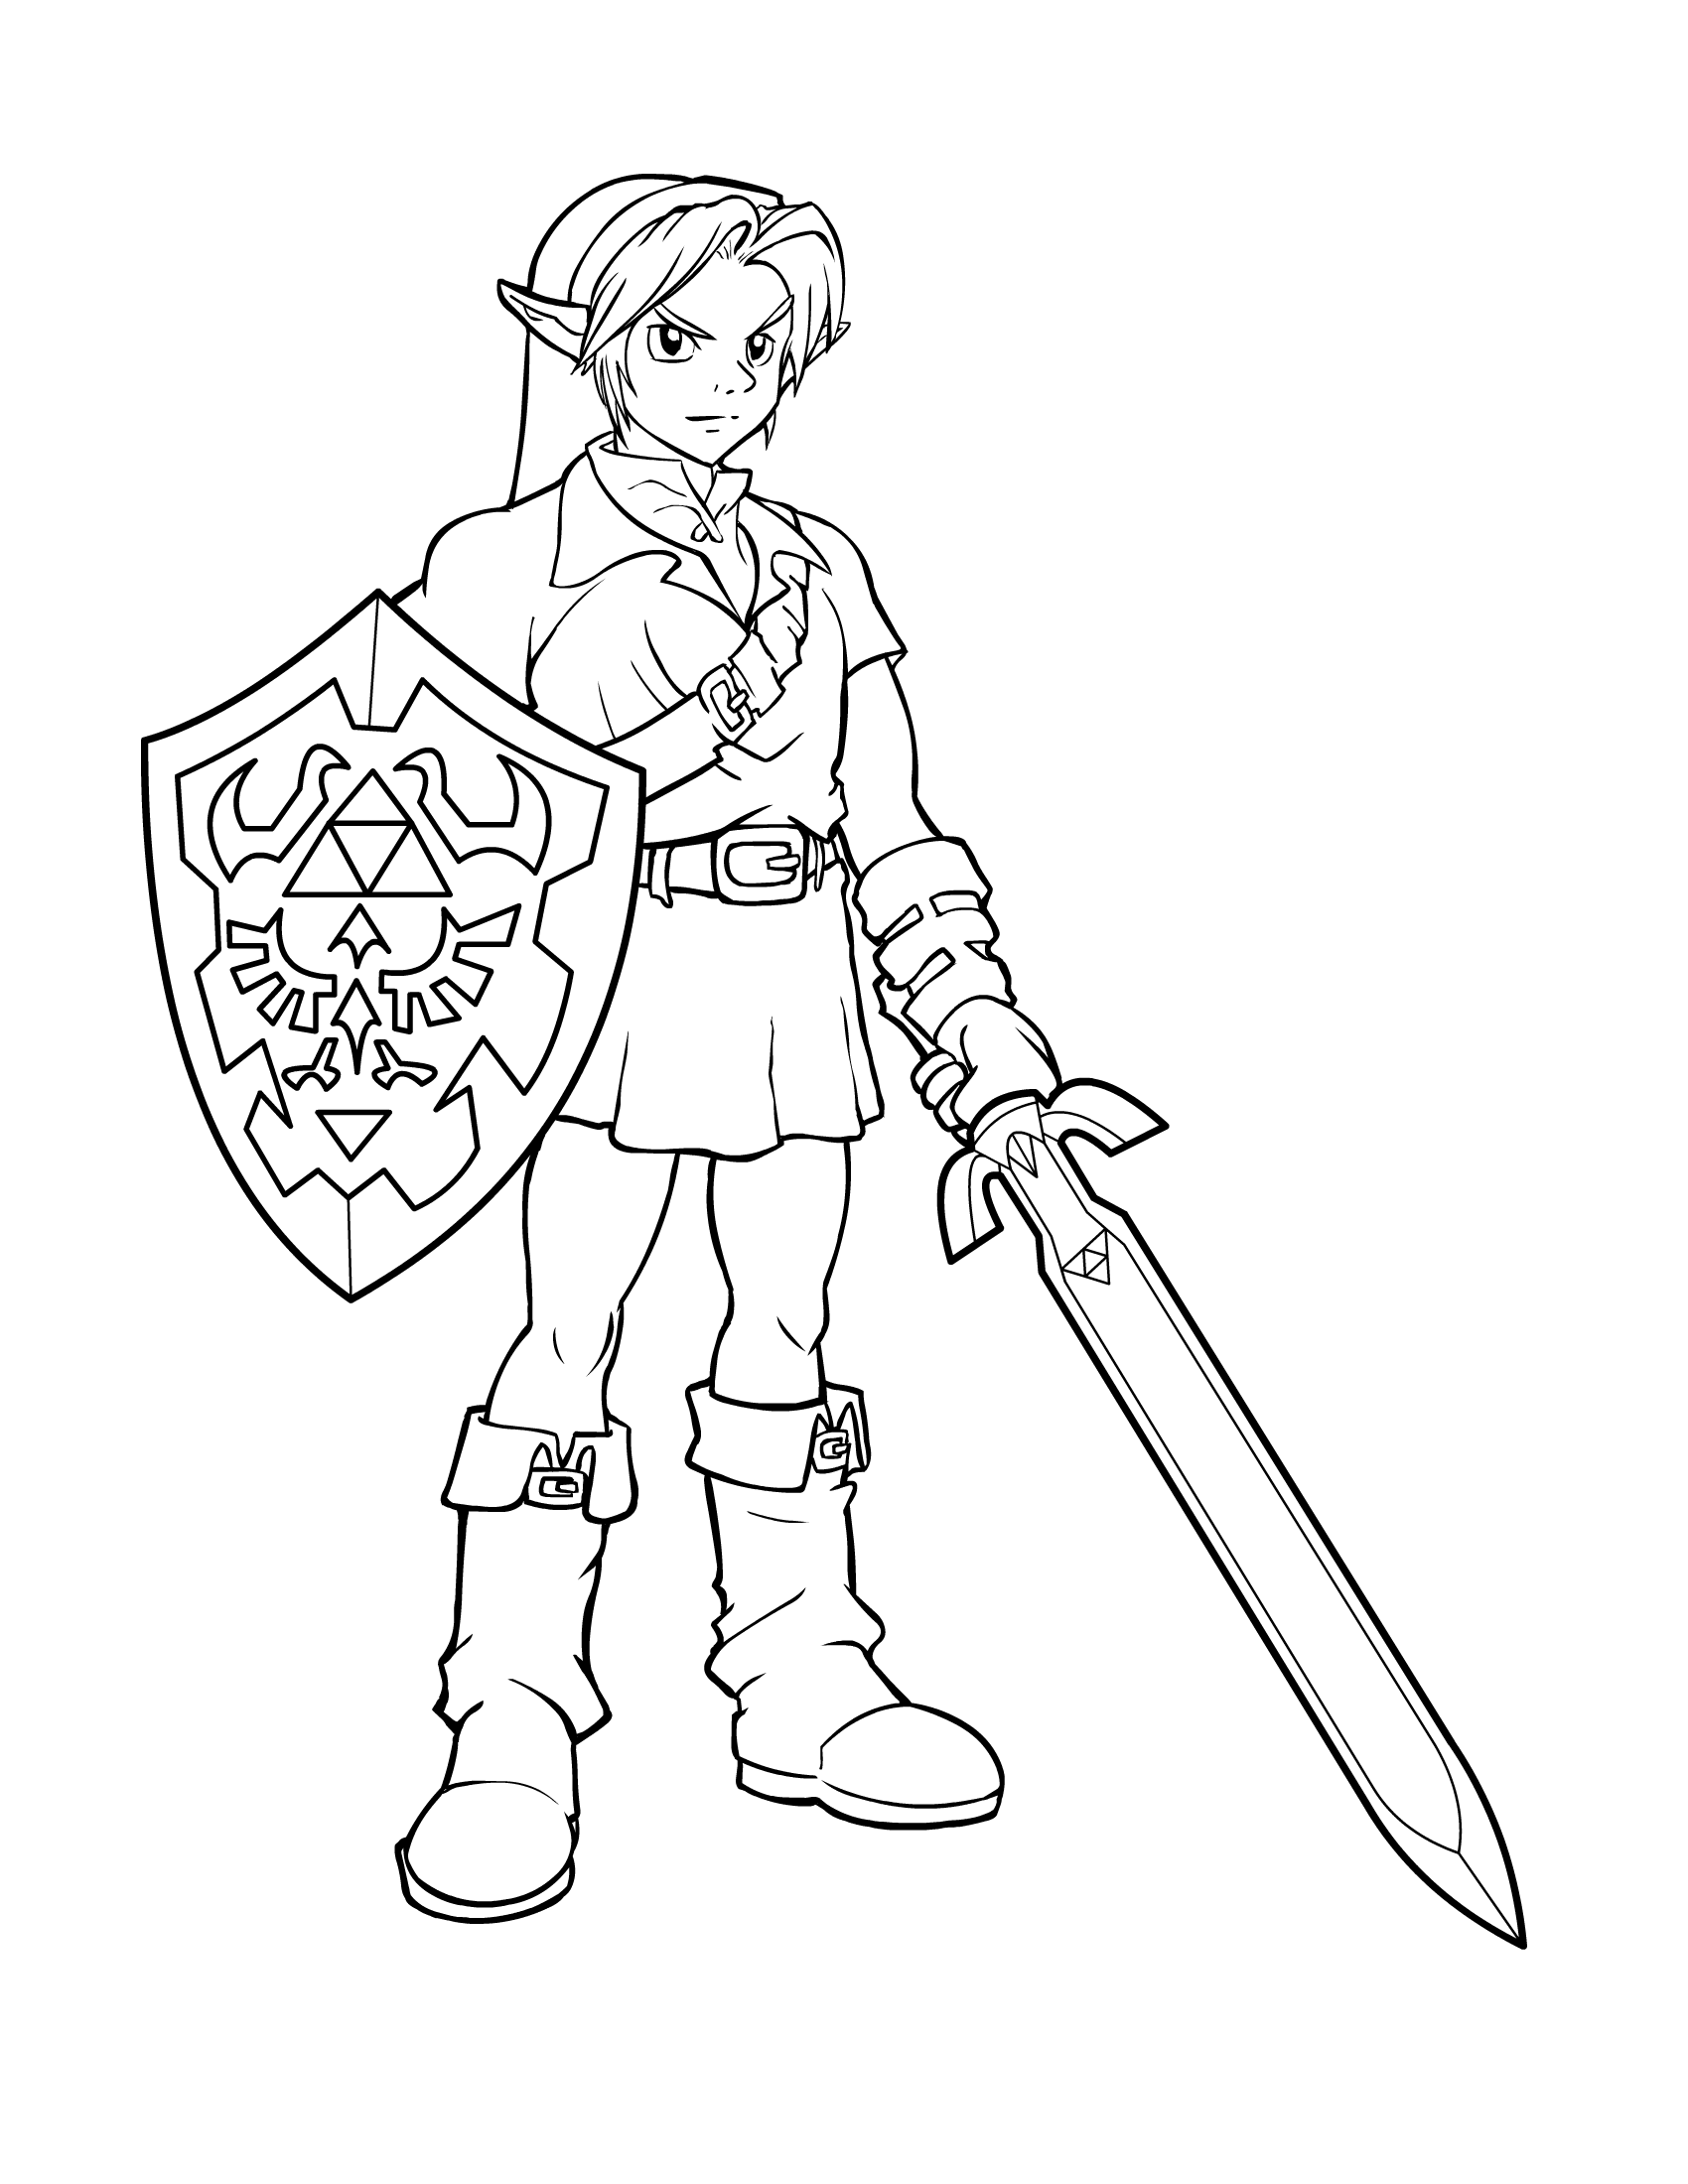 Beau Dessin A Imprimer Gratuit Zelda